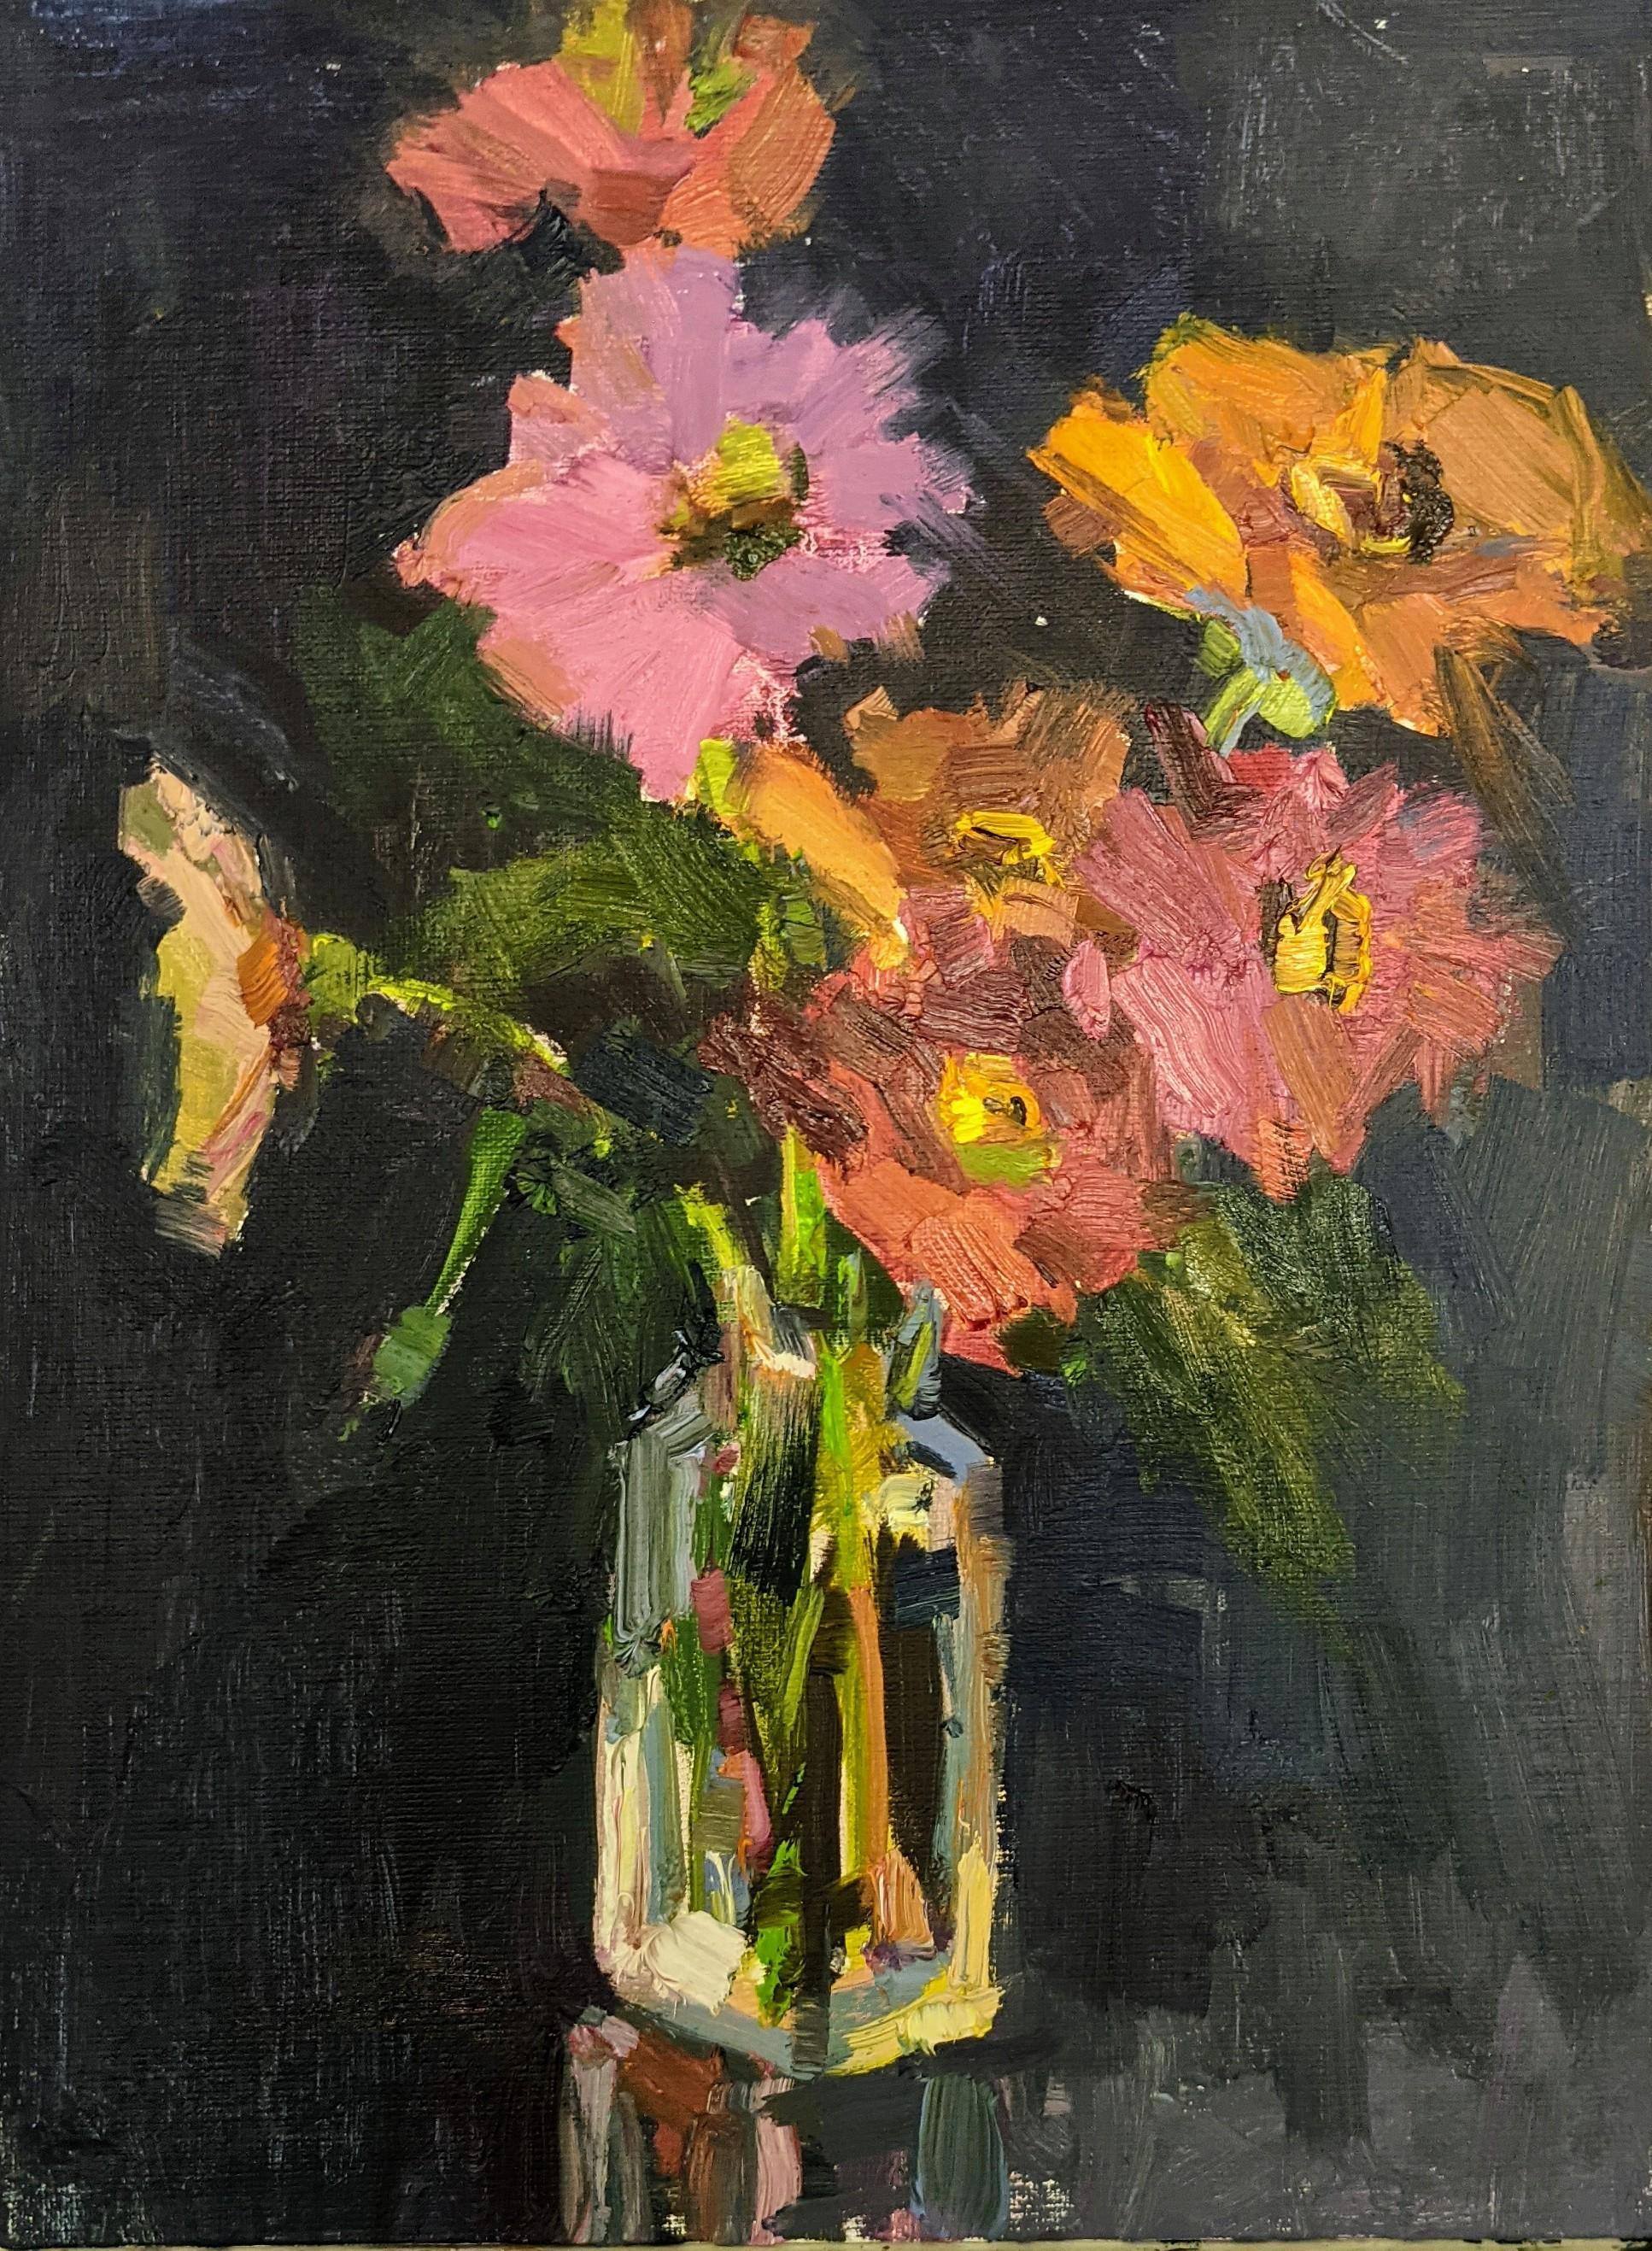 Fleurs V by Millie Gosch, Small Framed Oil on Board Still-Life Painting